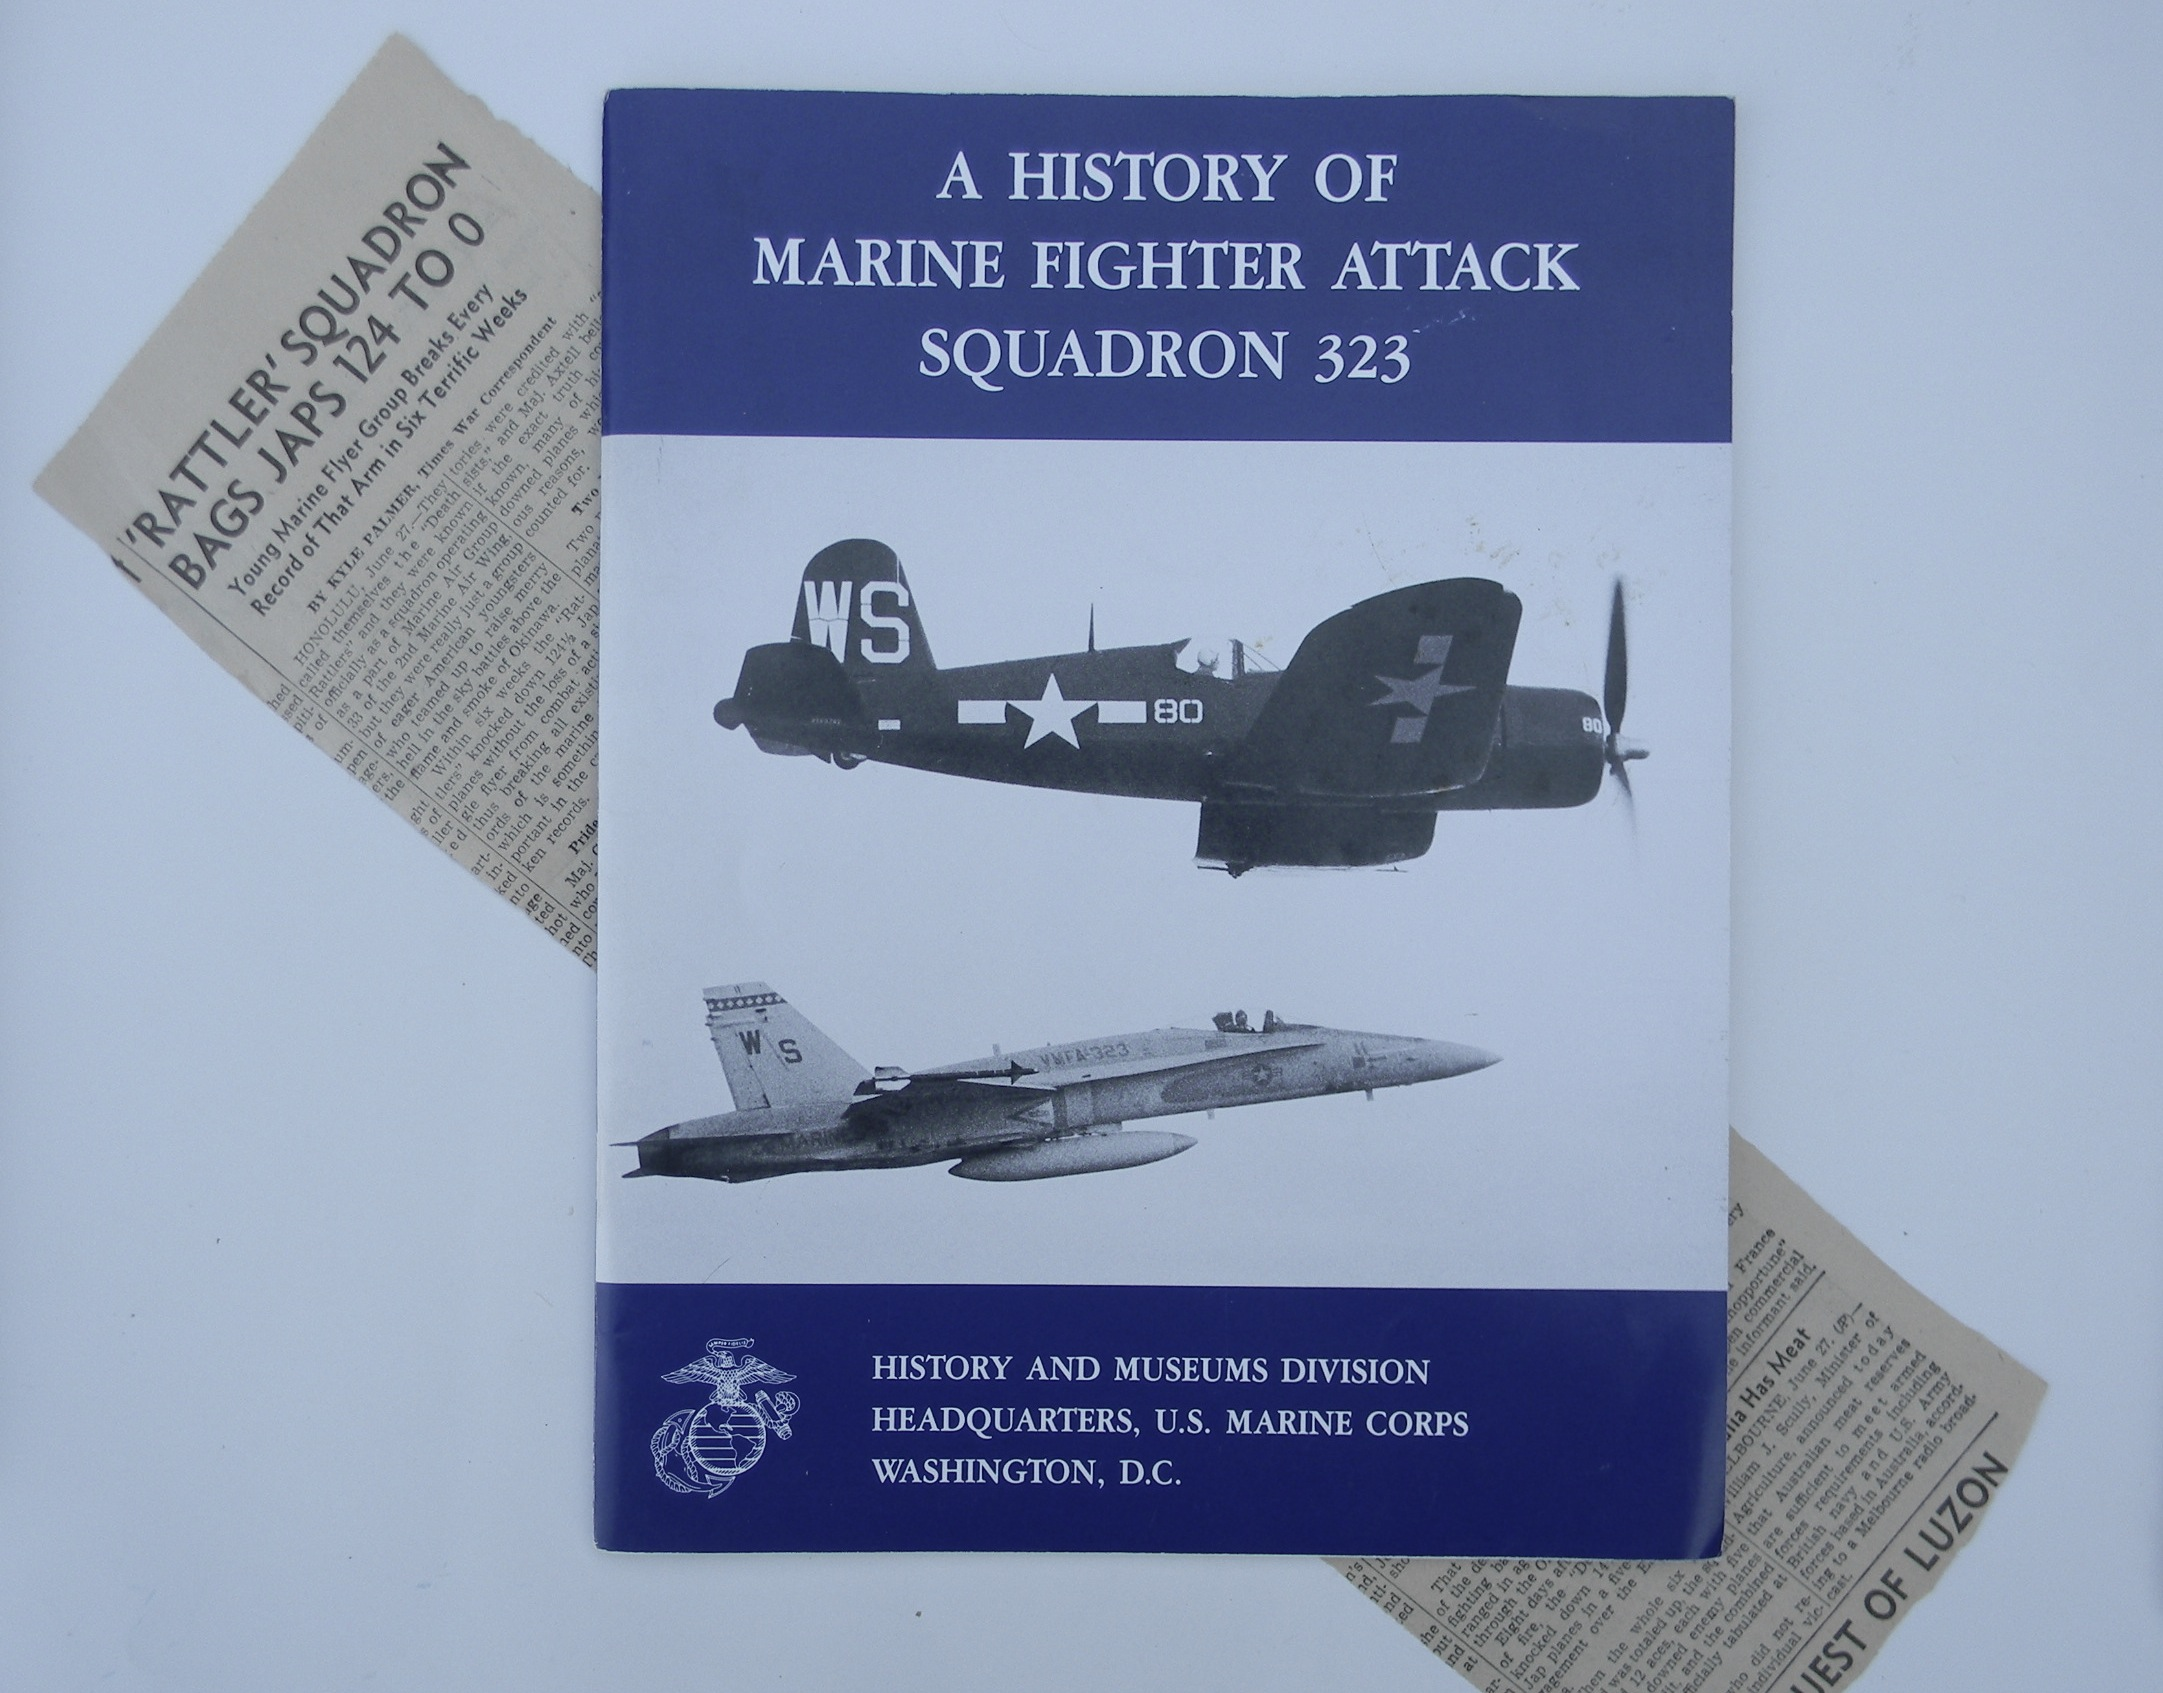 VMF-323 history